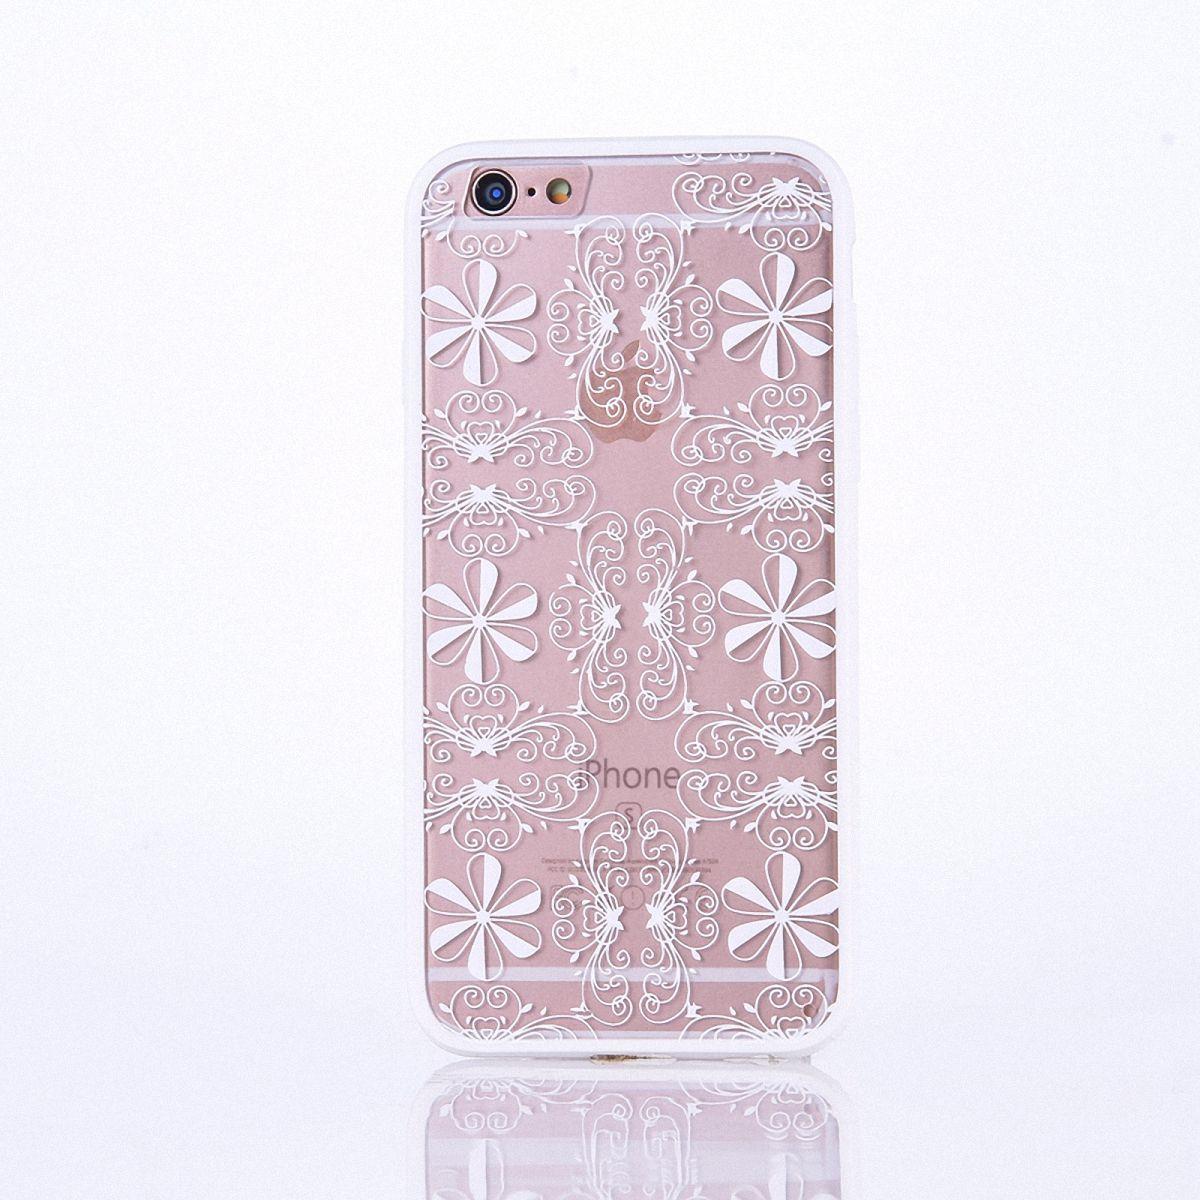 Handy Hülle Mandala für Apple iPhone 8 Plus Design Case Schutzhülle Motiv Ornamente Cover Tasche Bumper Weiß